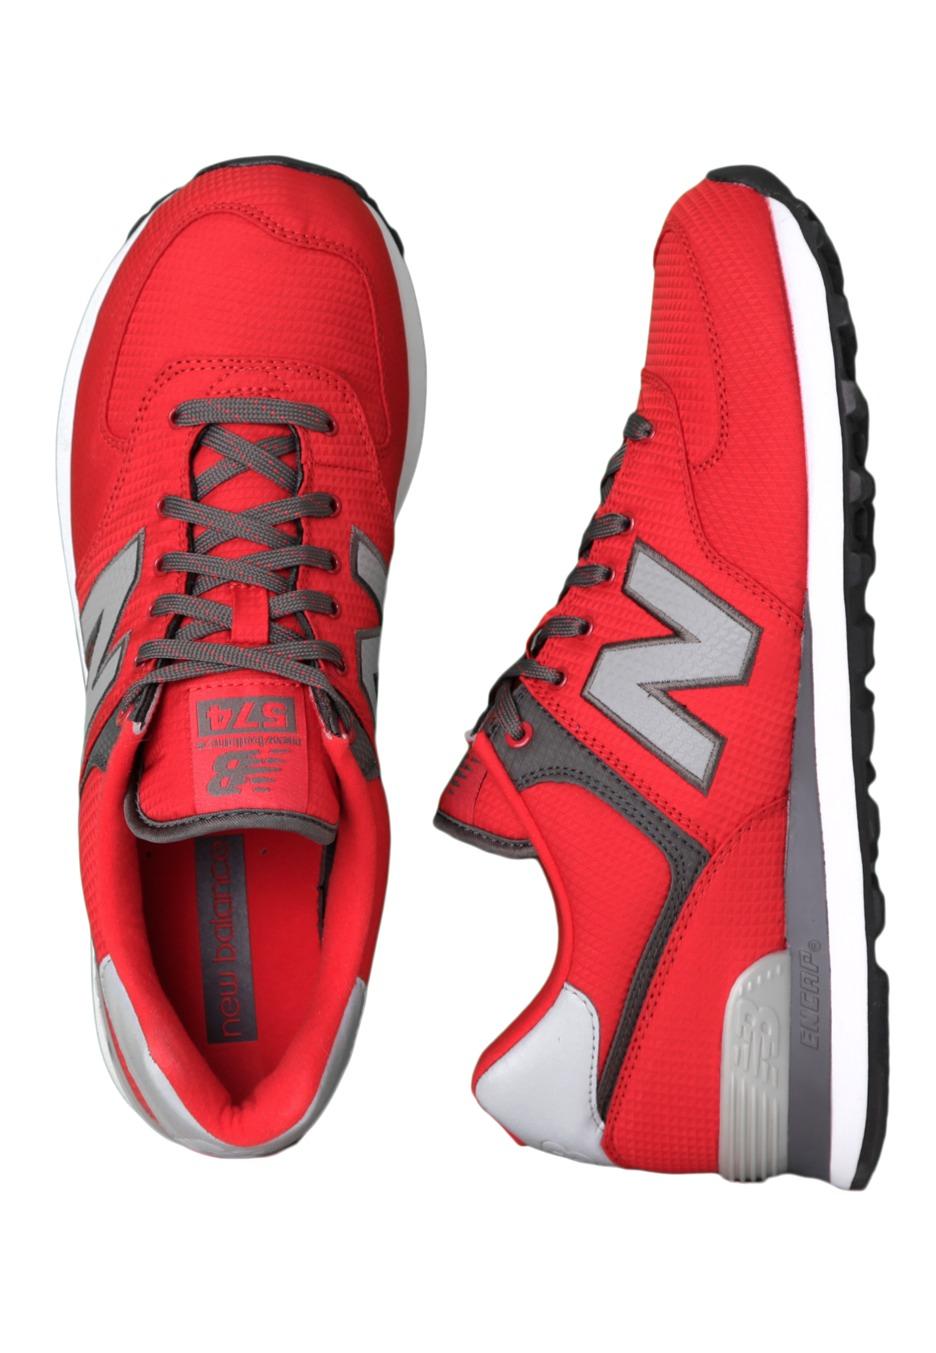 half off b1b6a 57d90 New Balance - ML574 Red/Black - Shoes